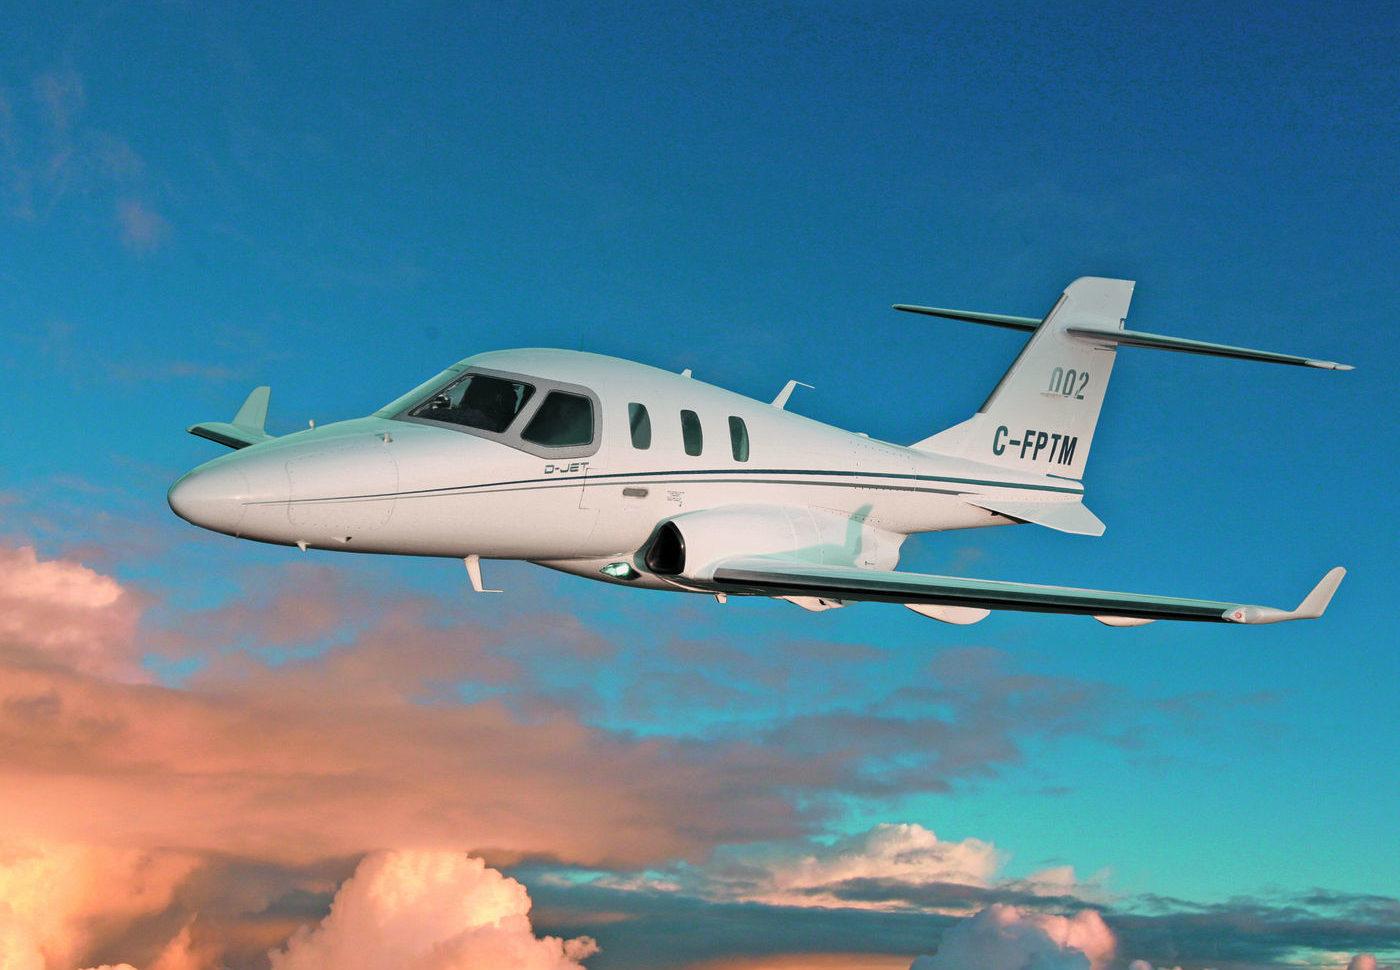 Neuer Schub: Diamonds D-Jet fliegt wieder